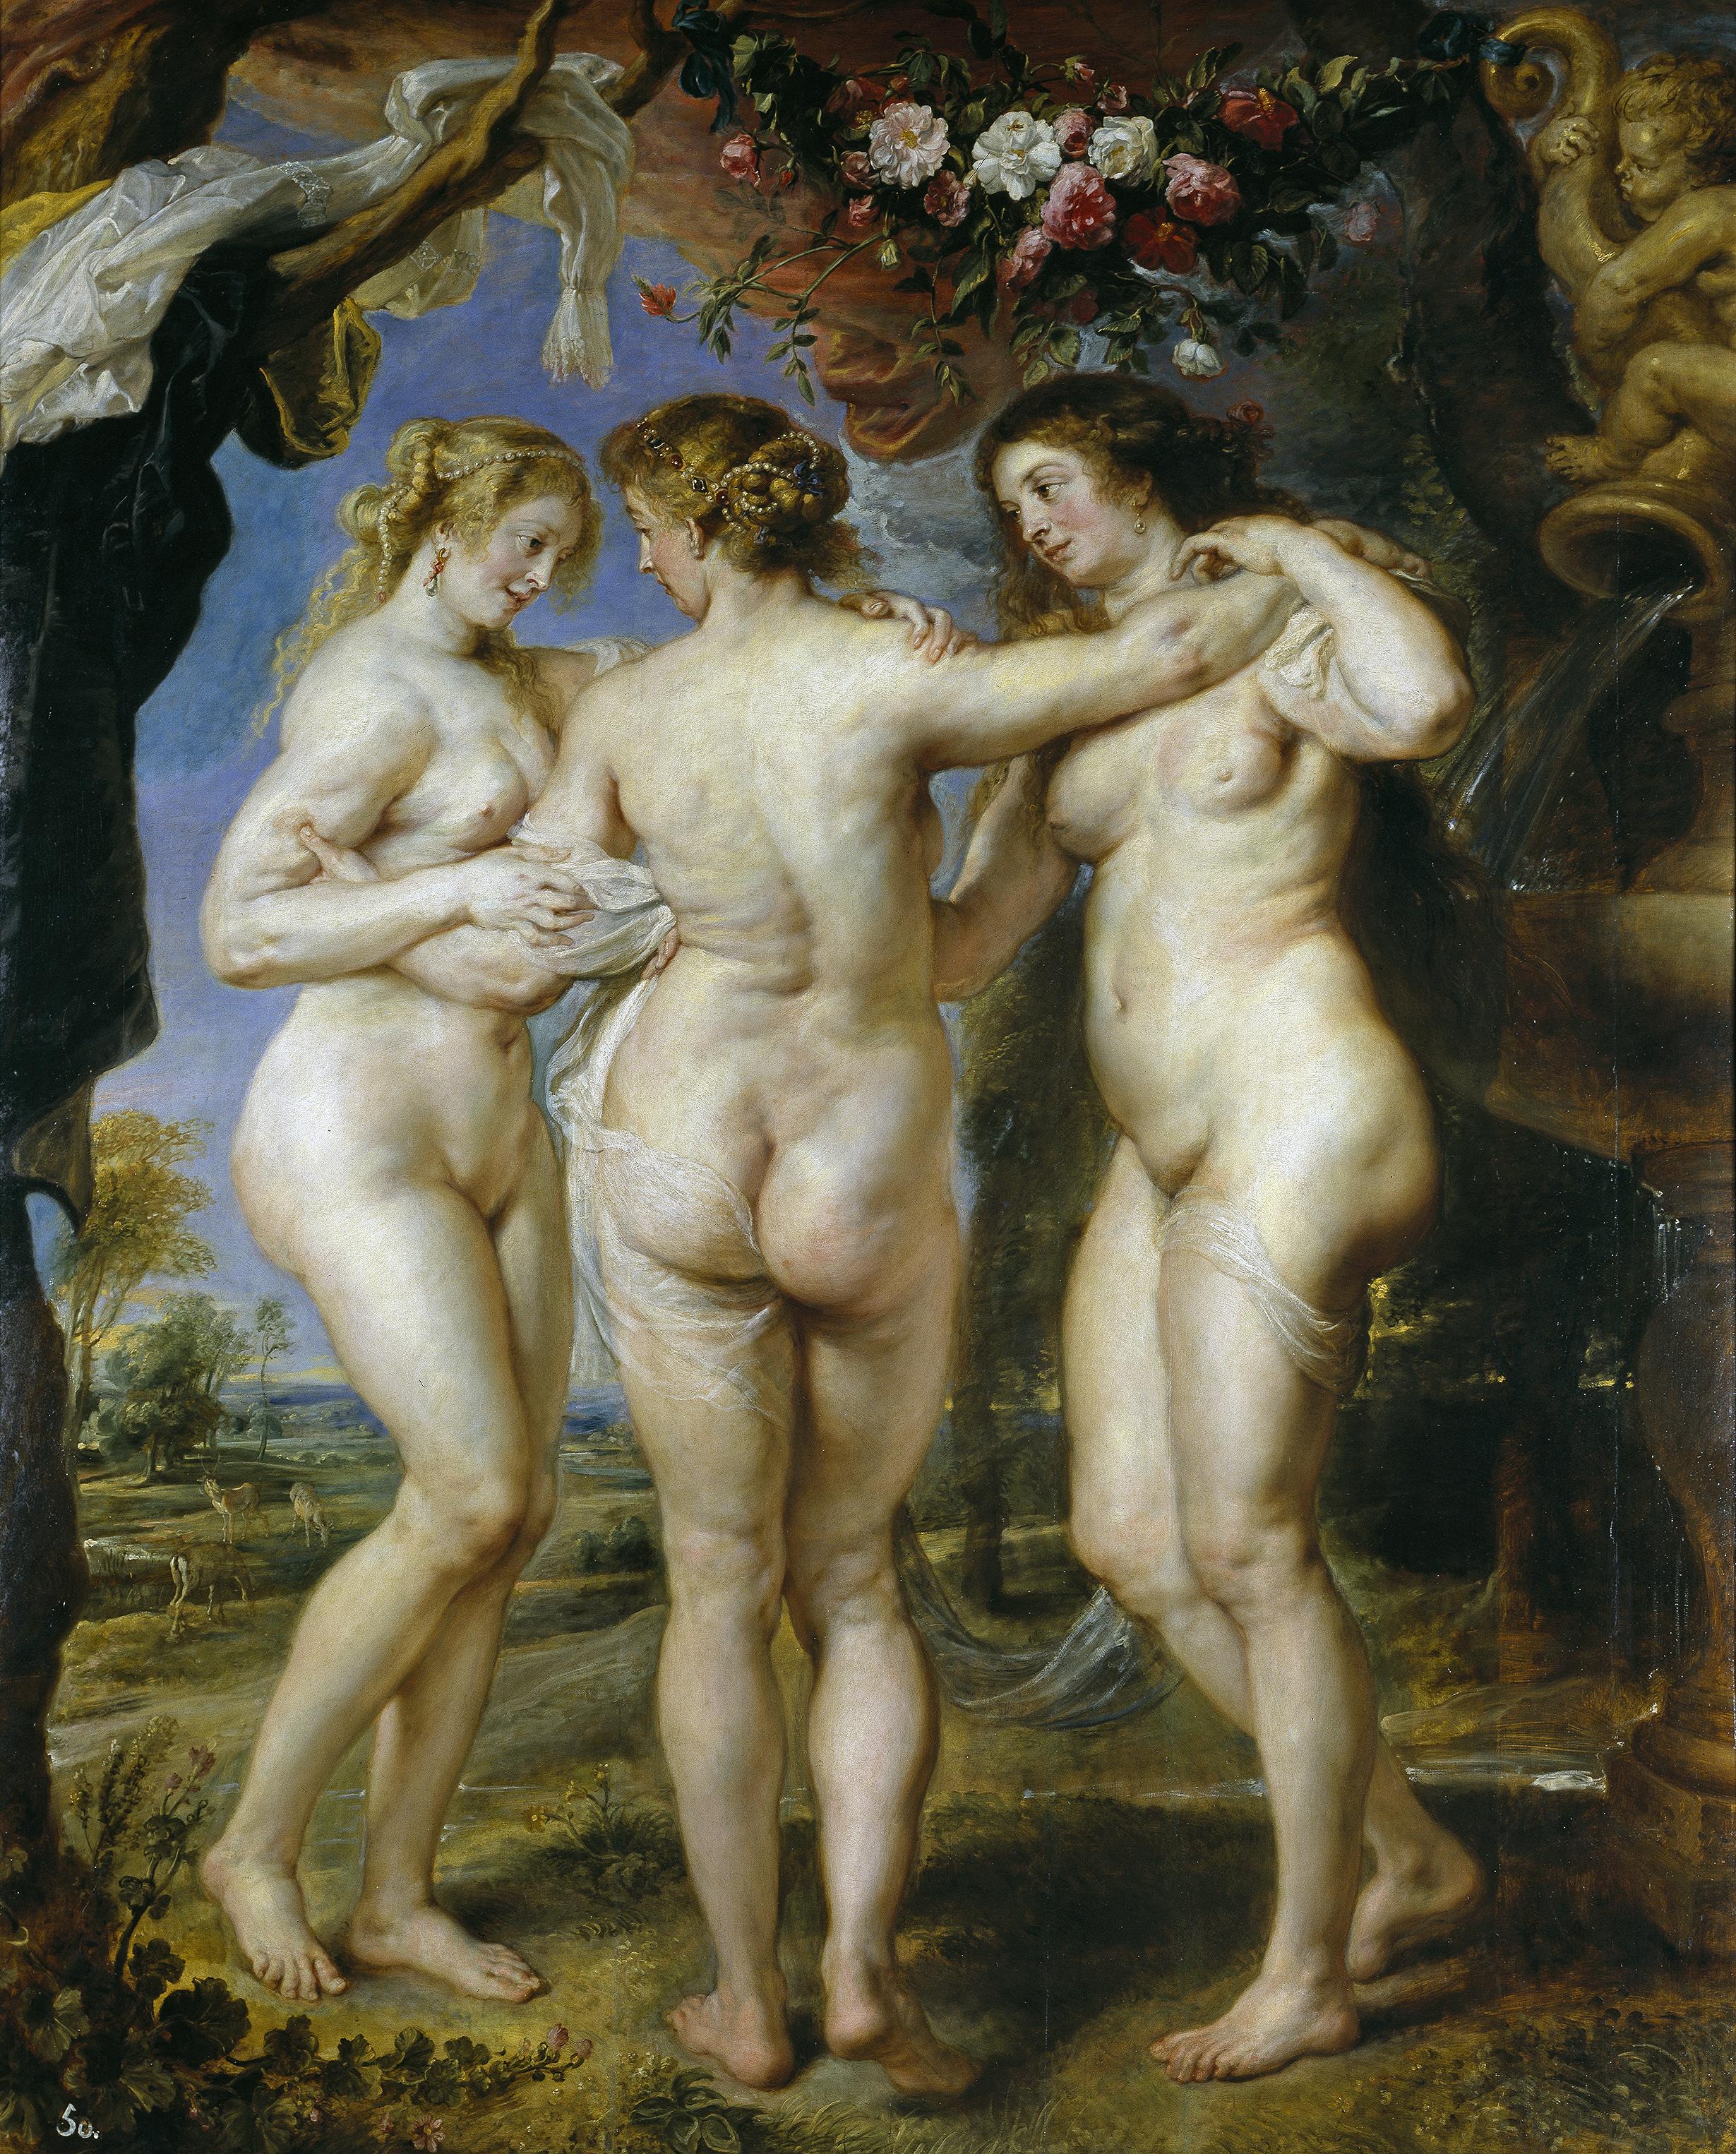 Peter Paul Rubens, 1577-1640. Три грации. ок.1635. 221 х 181 см. Мадрид, музей Прадо